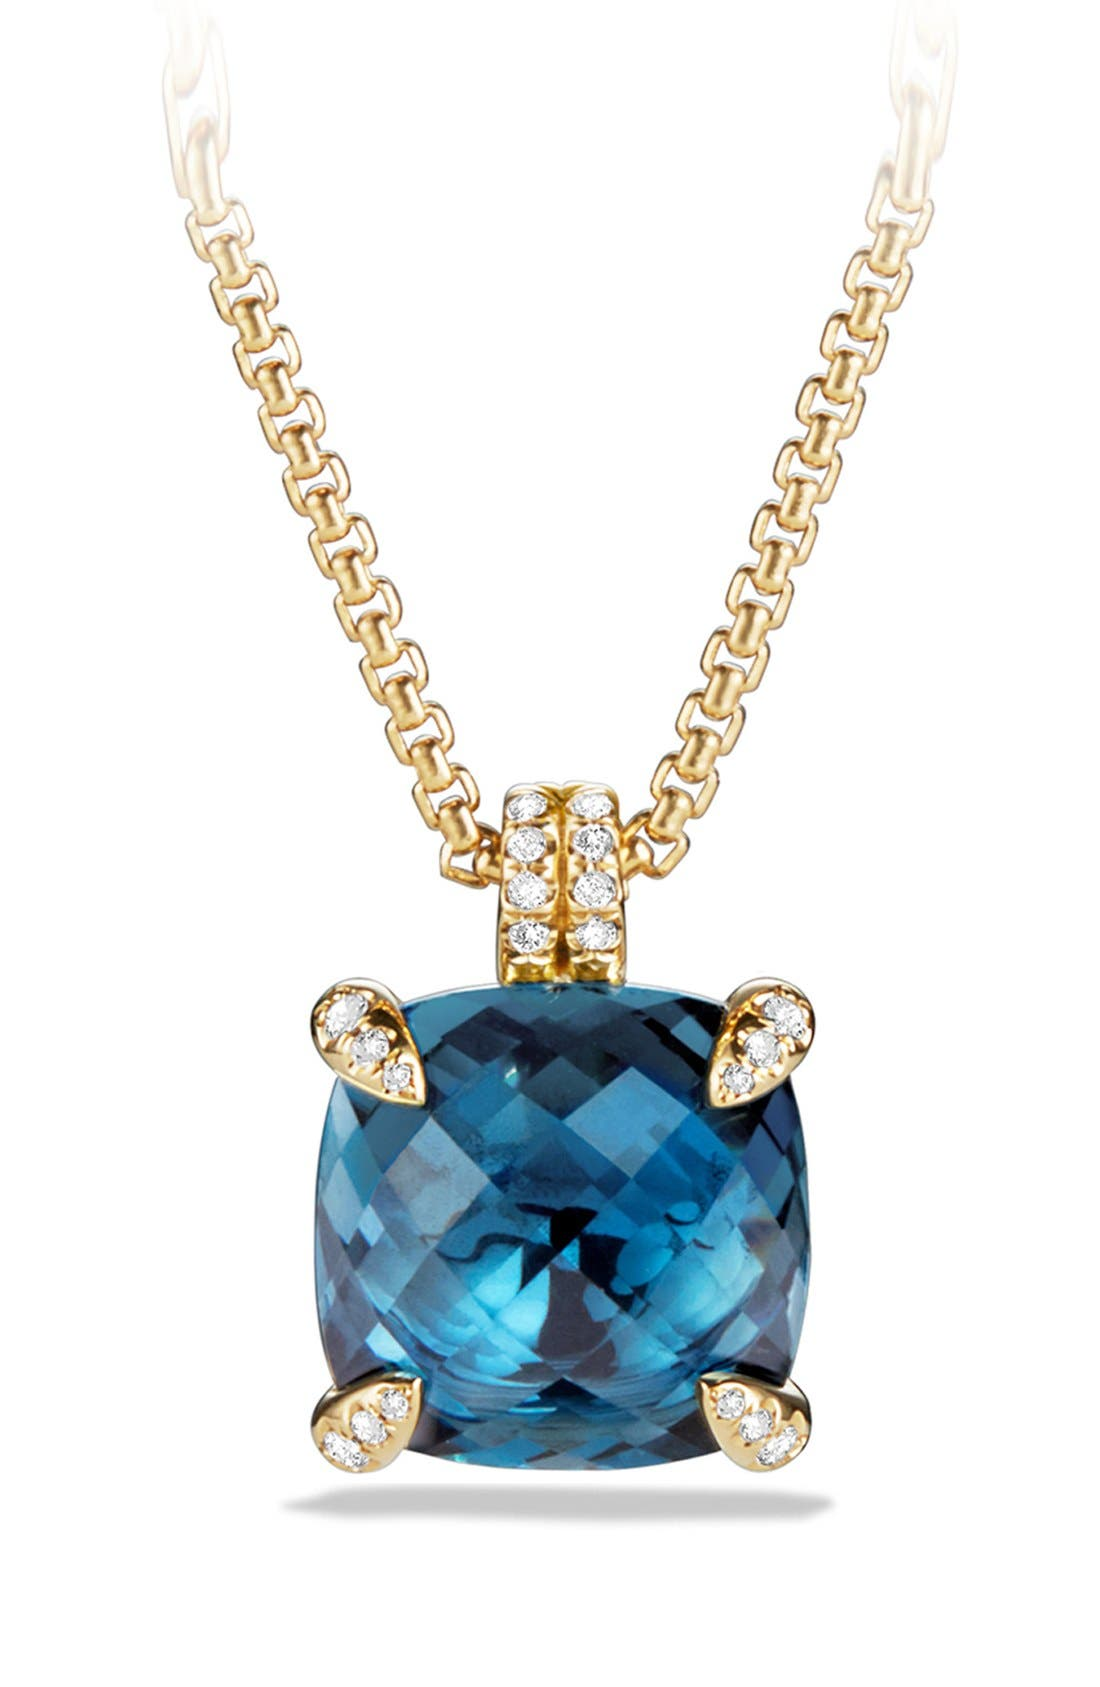 'Châtelaine' Pendant Necklace with Diamonds in 18K Gold,                             Main thumbnail 1, color,                             HAMPTON BLUE TOPAZ